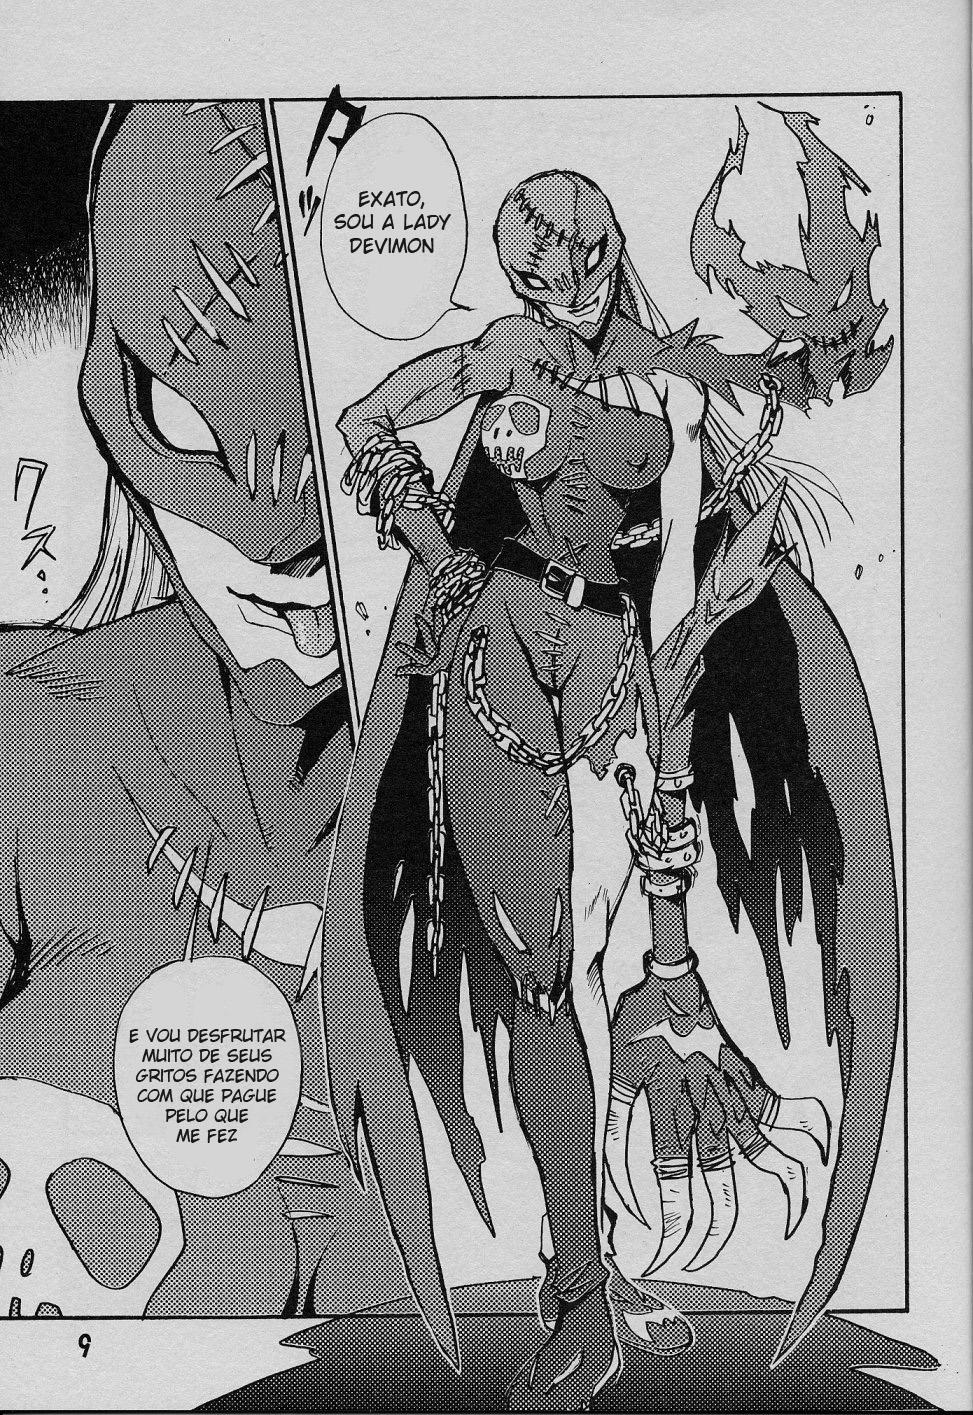 Digimon Hentai Pornô: O anjo caído - Foto 8